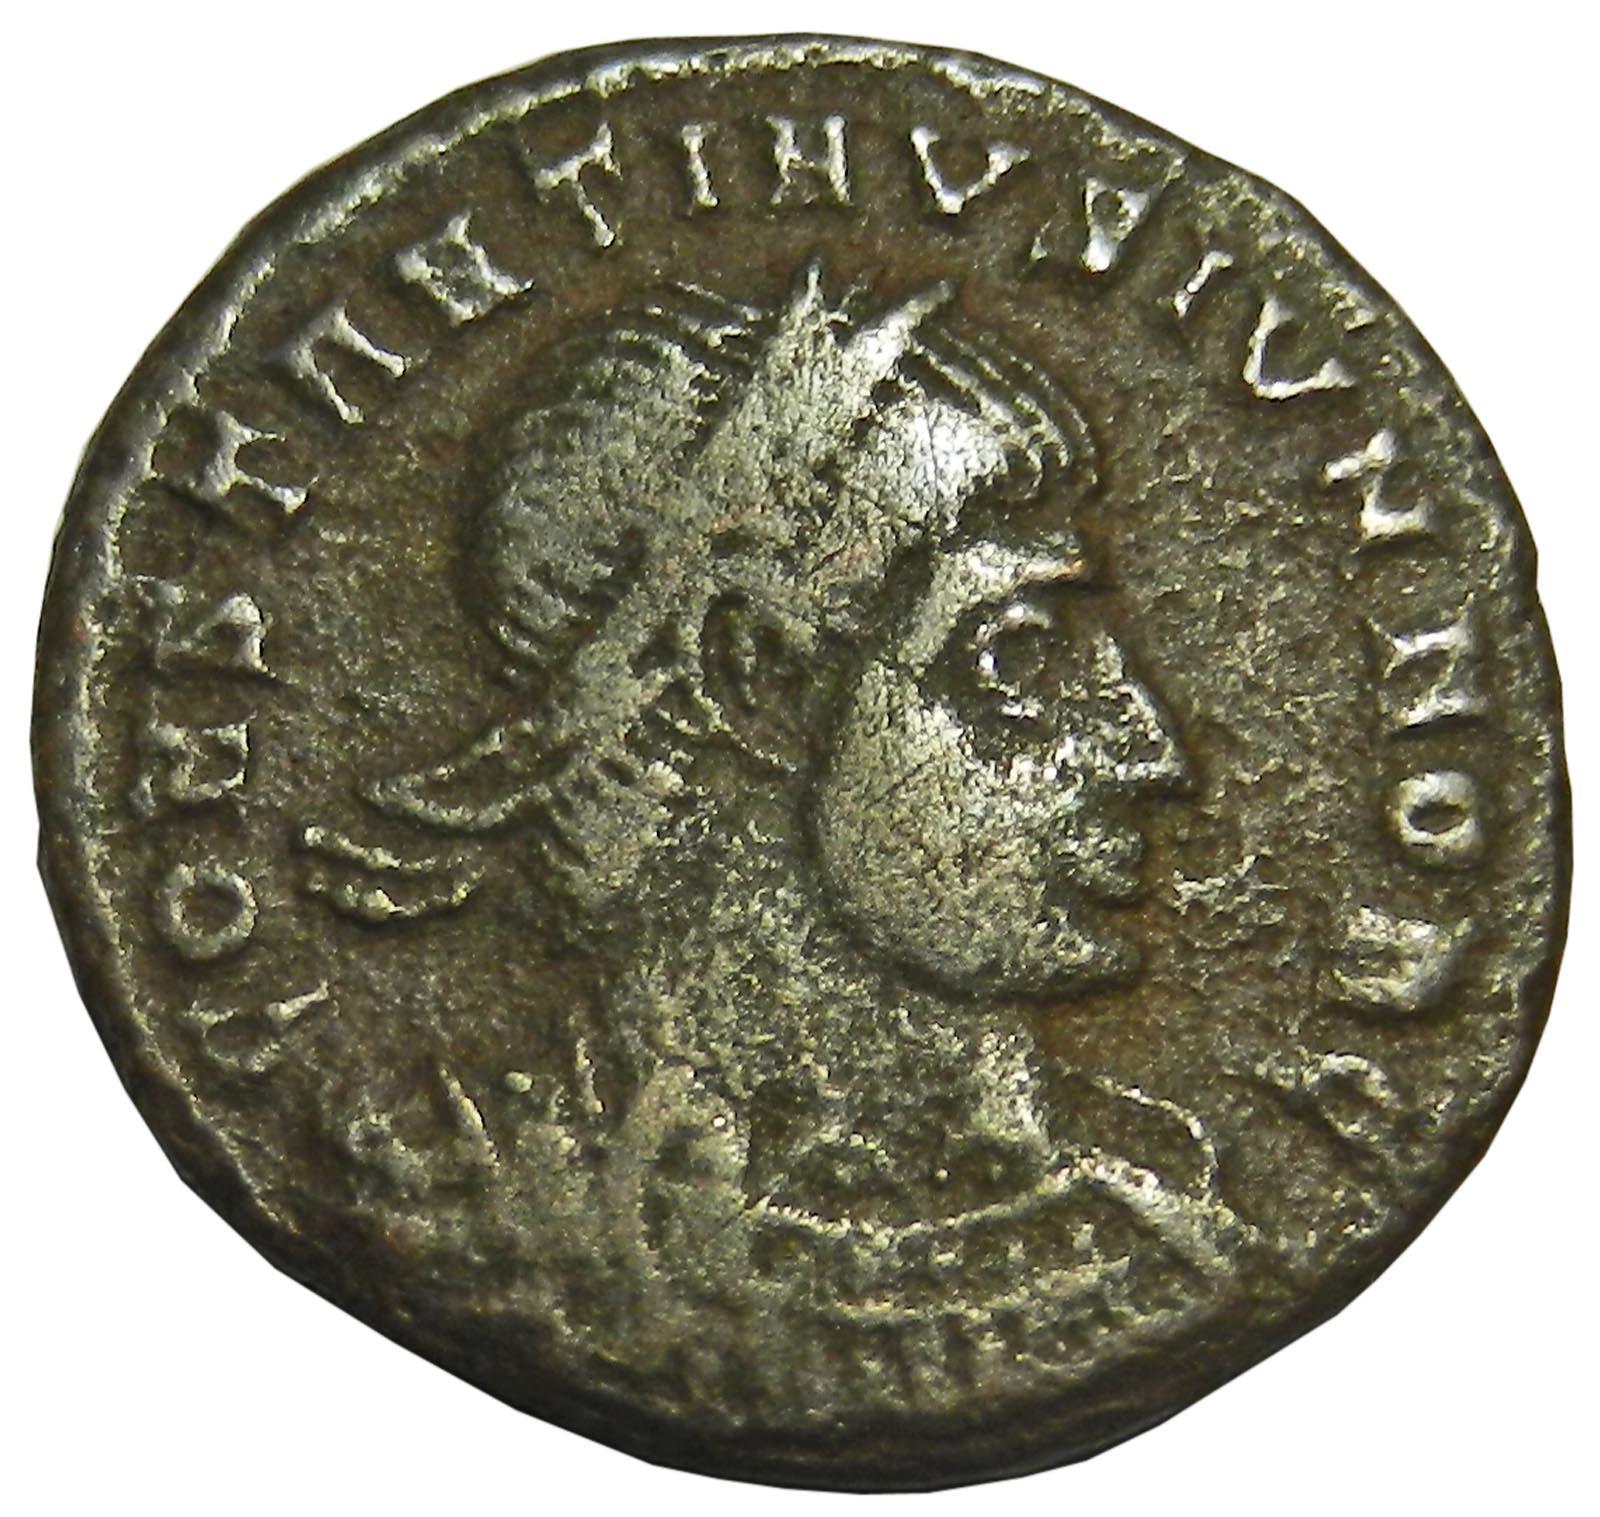 Монета фоллис. Константин II. Бронза. Древний Рим, 334-335 гг (Два солдата)